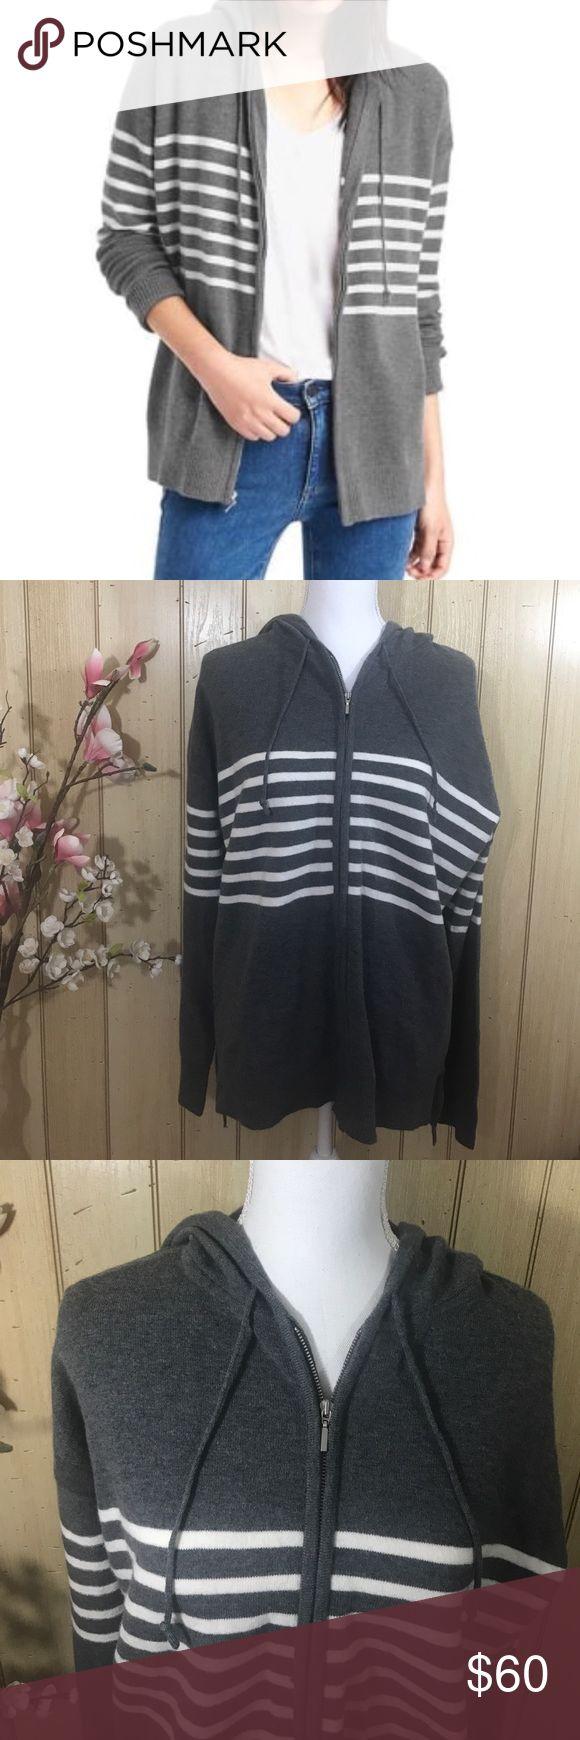 GAP Grey & White Zip Up Hoodie Sweatshirt NWT LG GAP Grey and White Striped Zip Up Hoodie RN#54023  57% Nylon 25% Wool 15% Acrylic 3% Spandex  Zip up hoodie  Heather Grey White Strips Brand-GAP  Size-Large - Women's  Retail Price-$79.95+tax NEW WITH TAGS, never worn. GAP Tops Sweatshirts & Hoodies